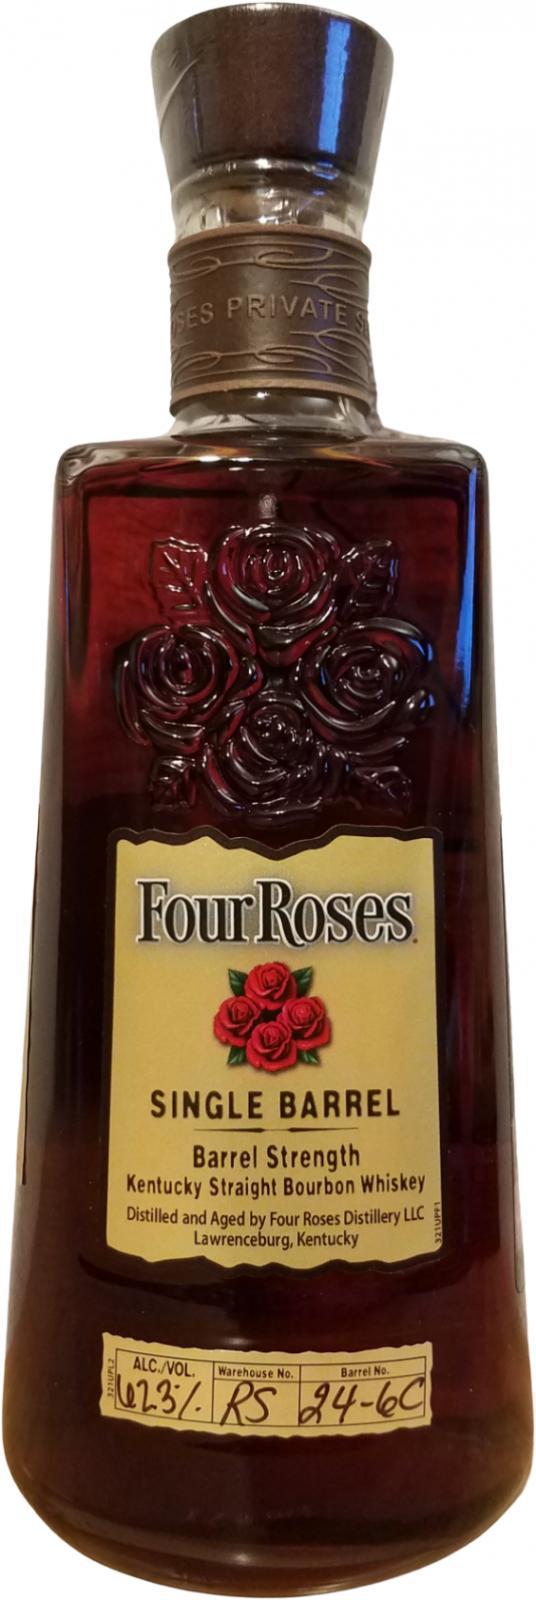 Four Roses SIngle Barrel Select